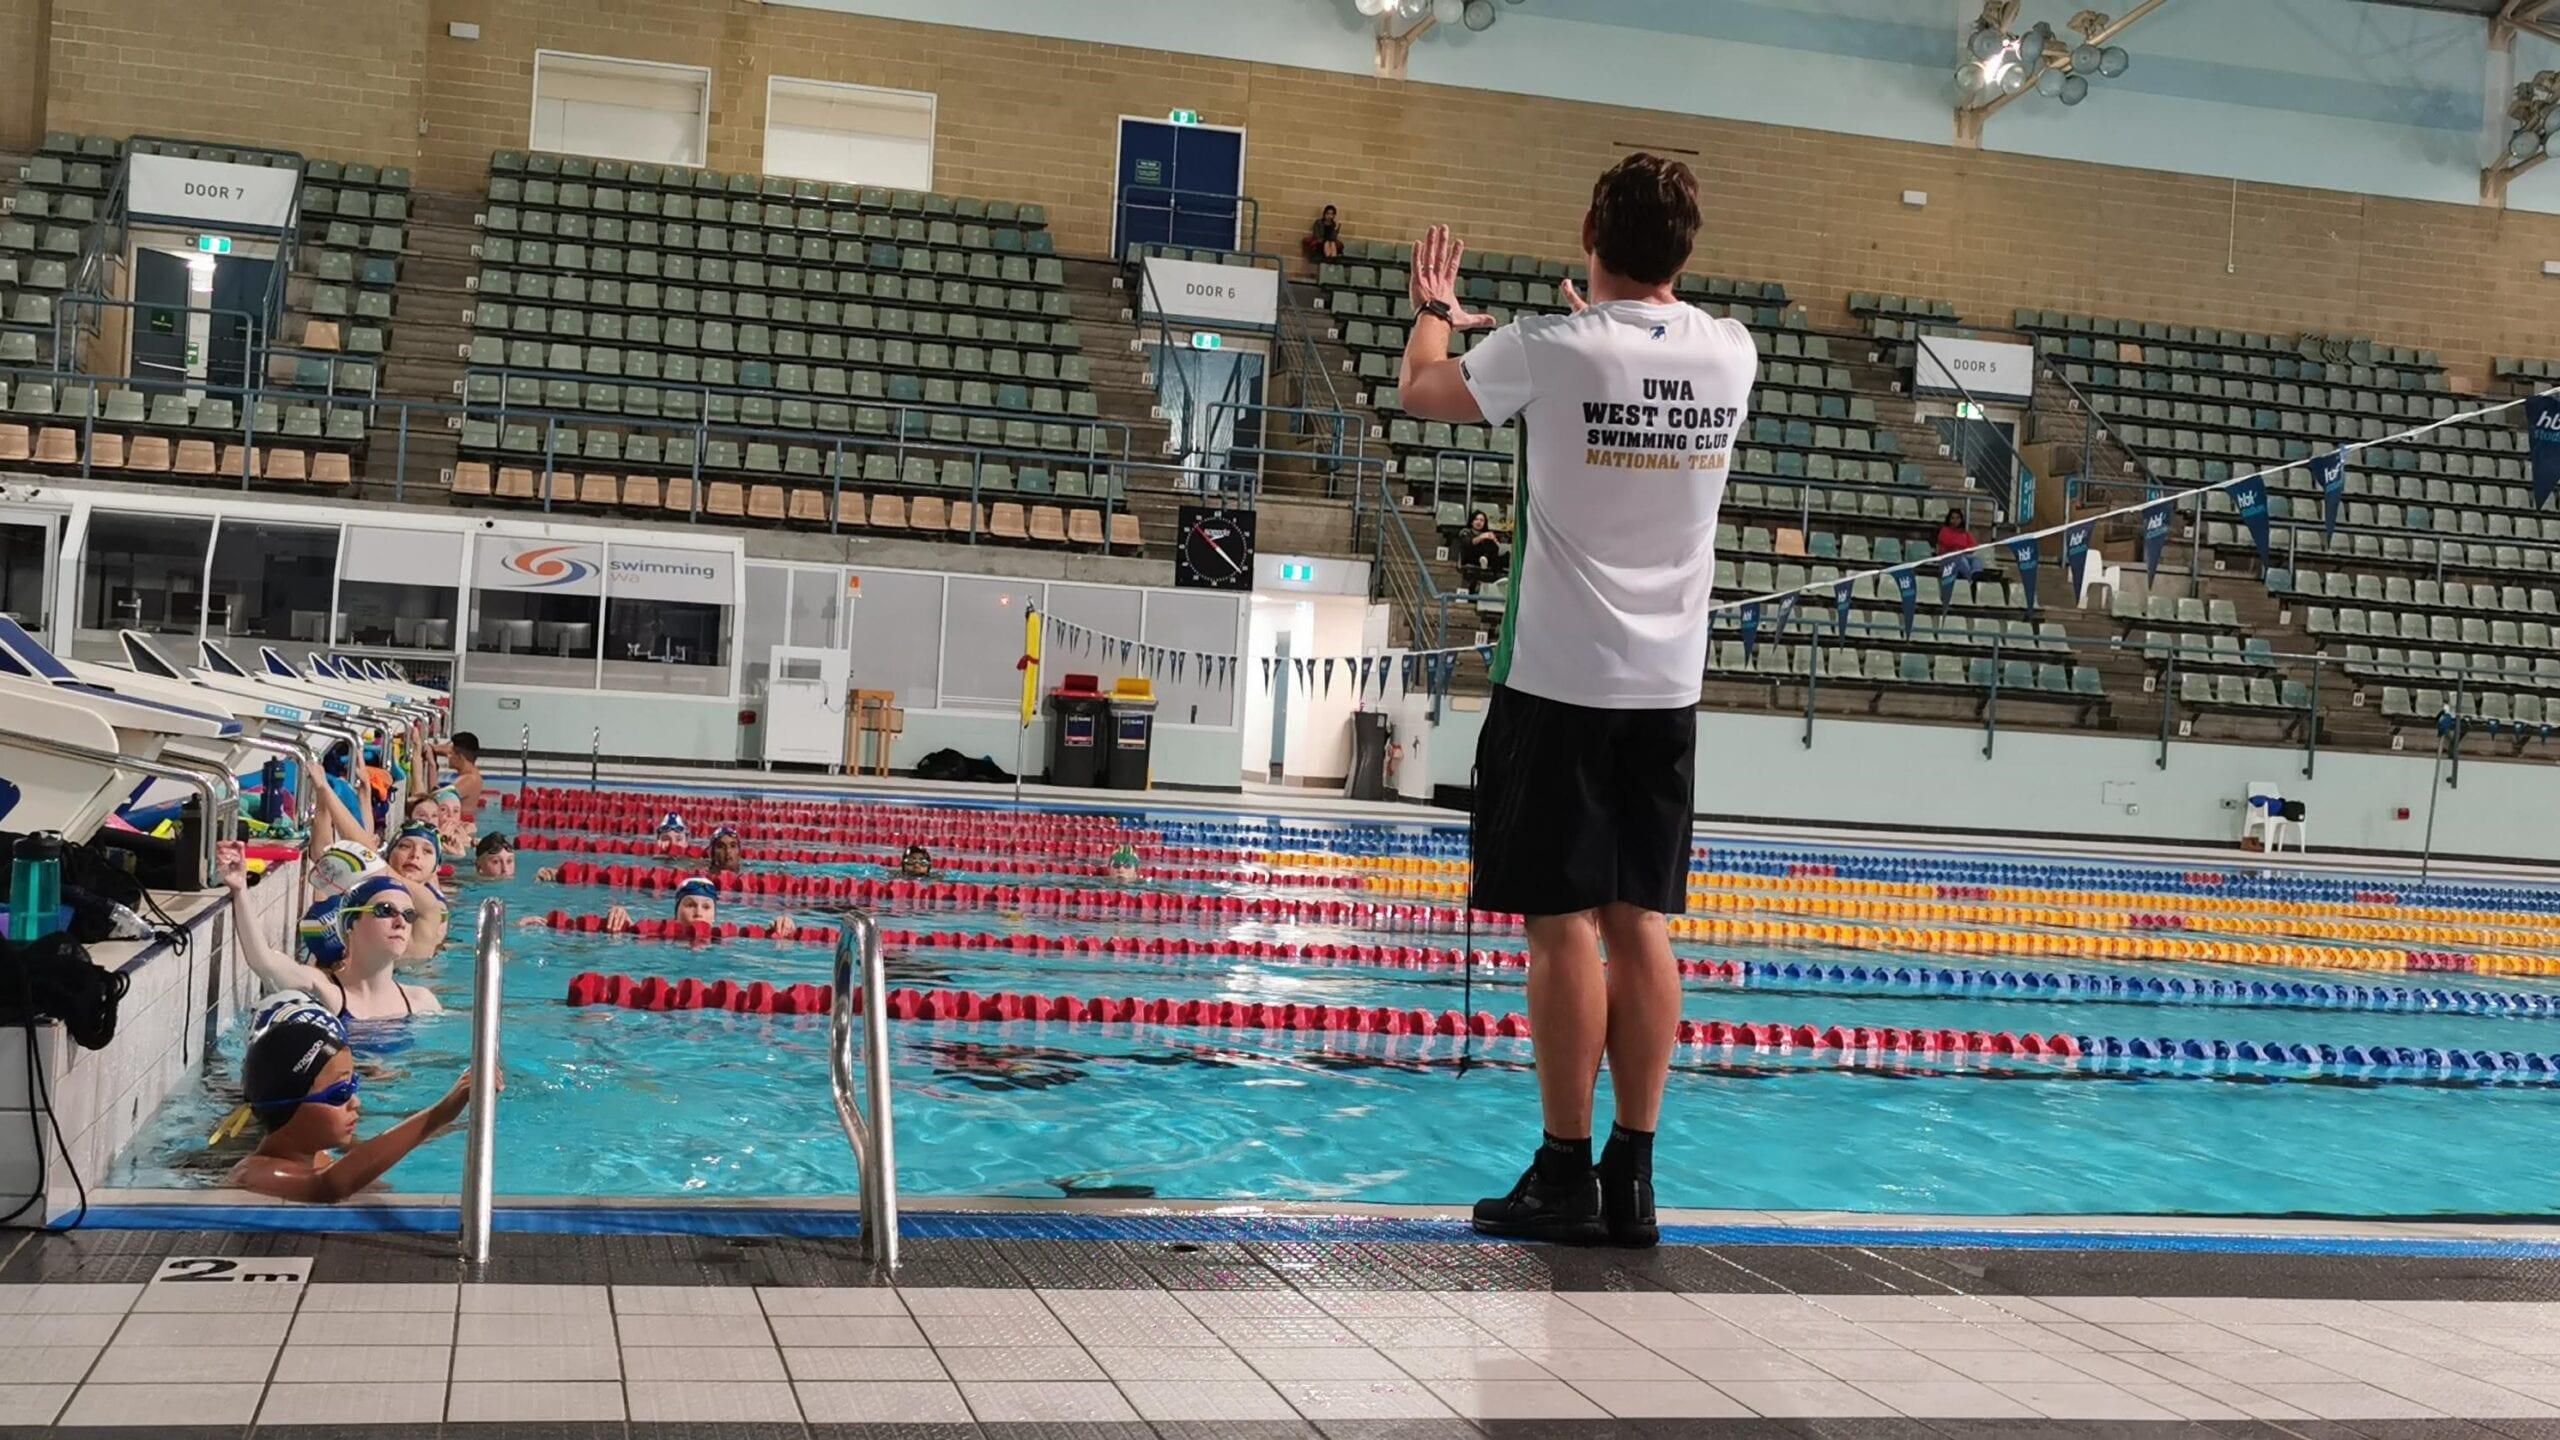 UWA West Coast Swimming Club Squad Administration